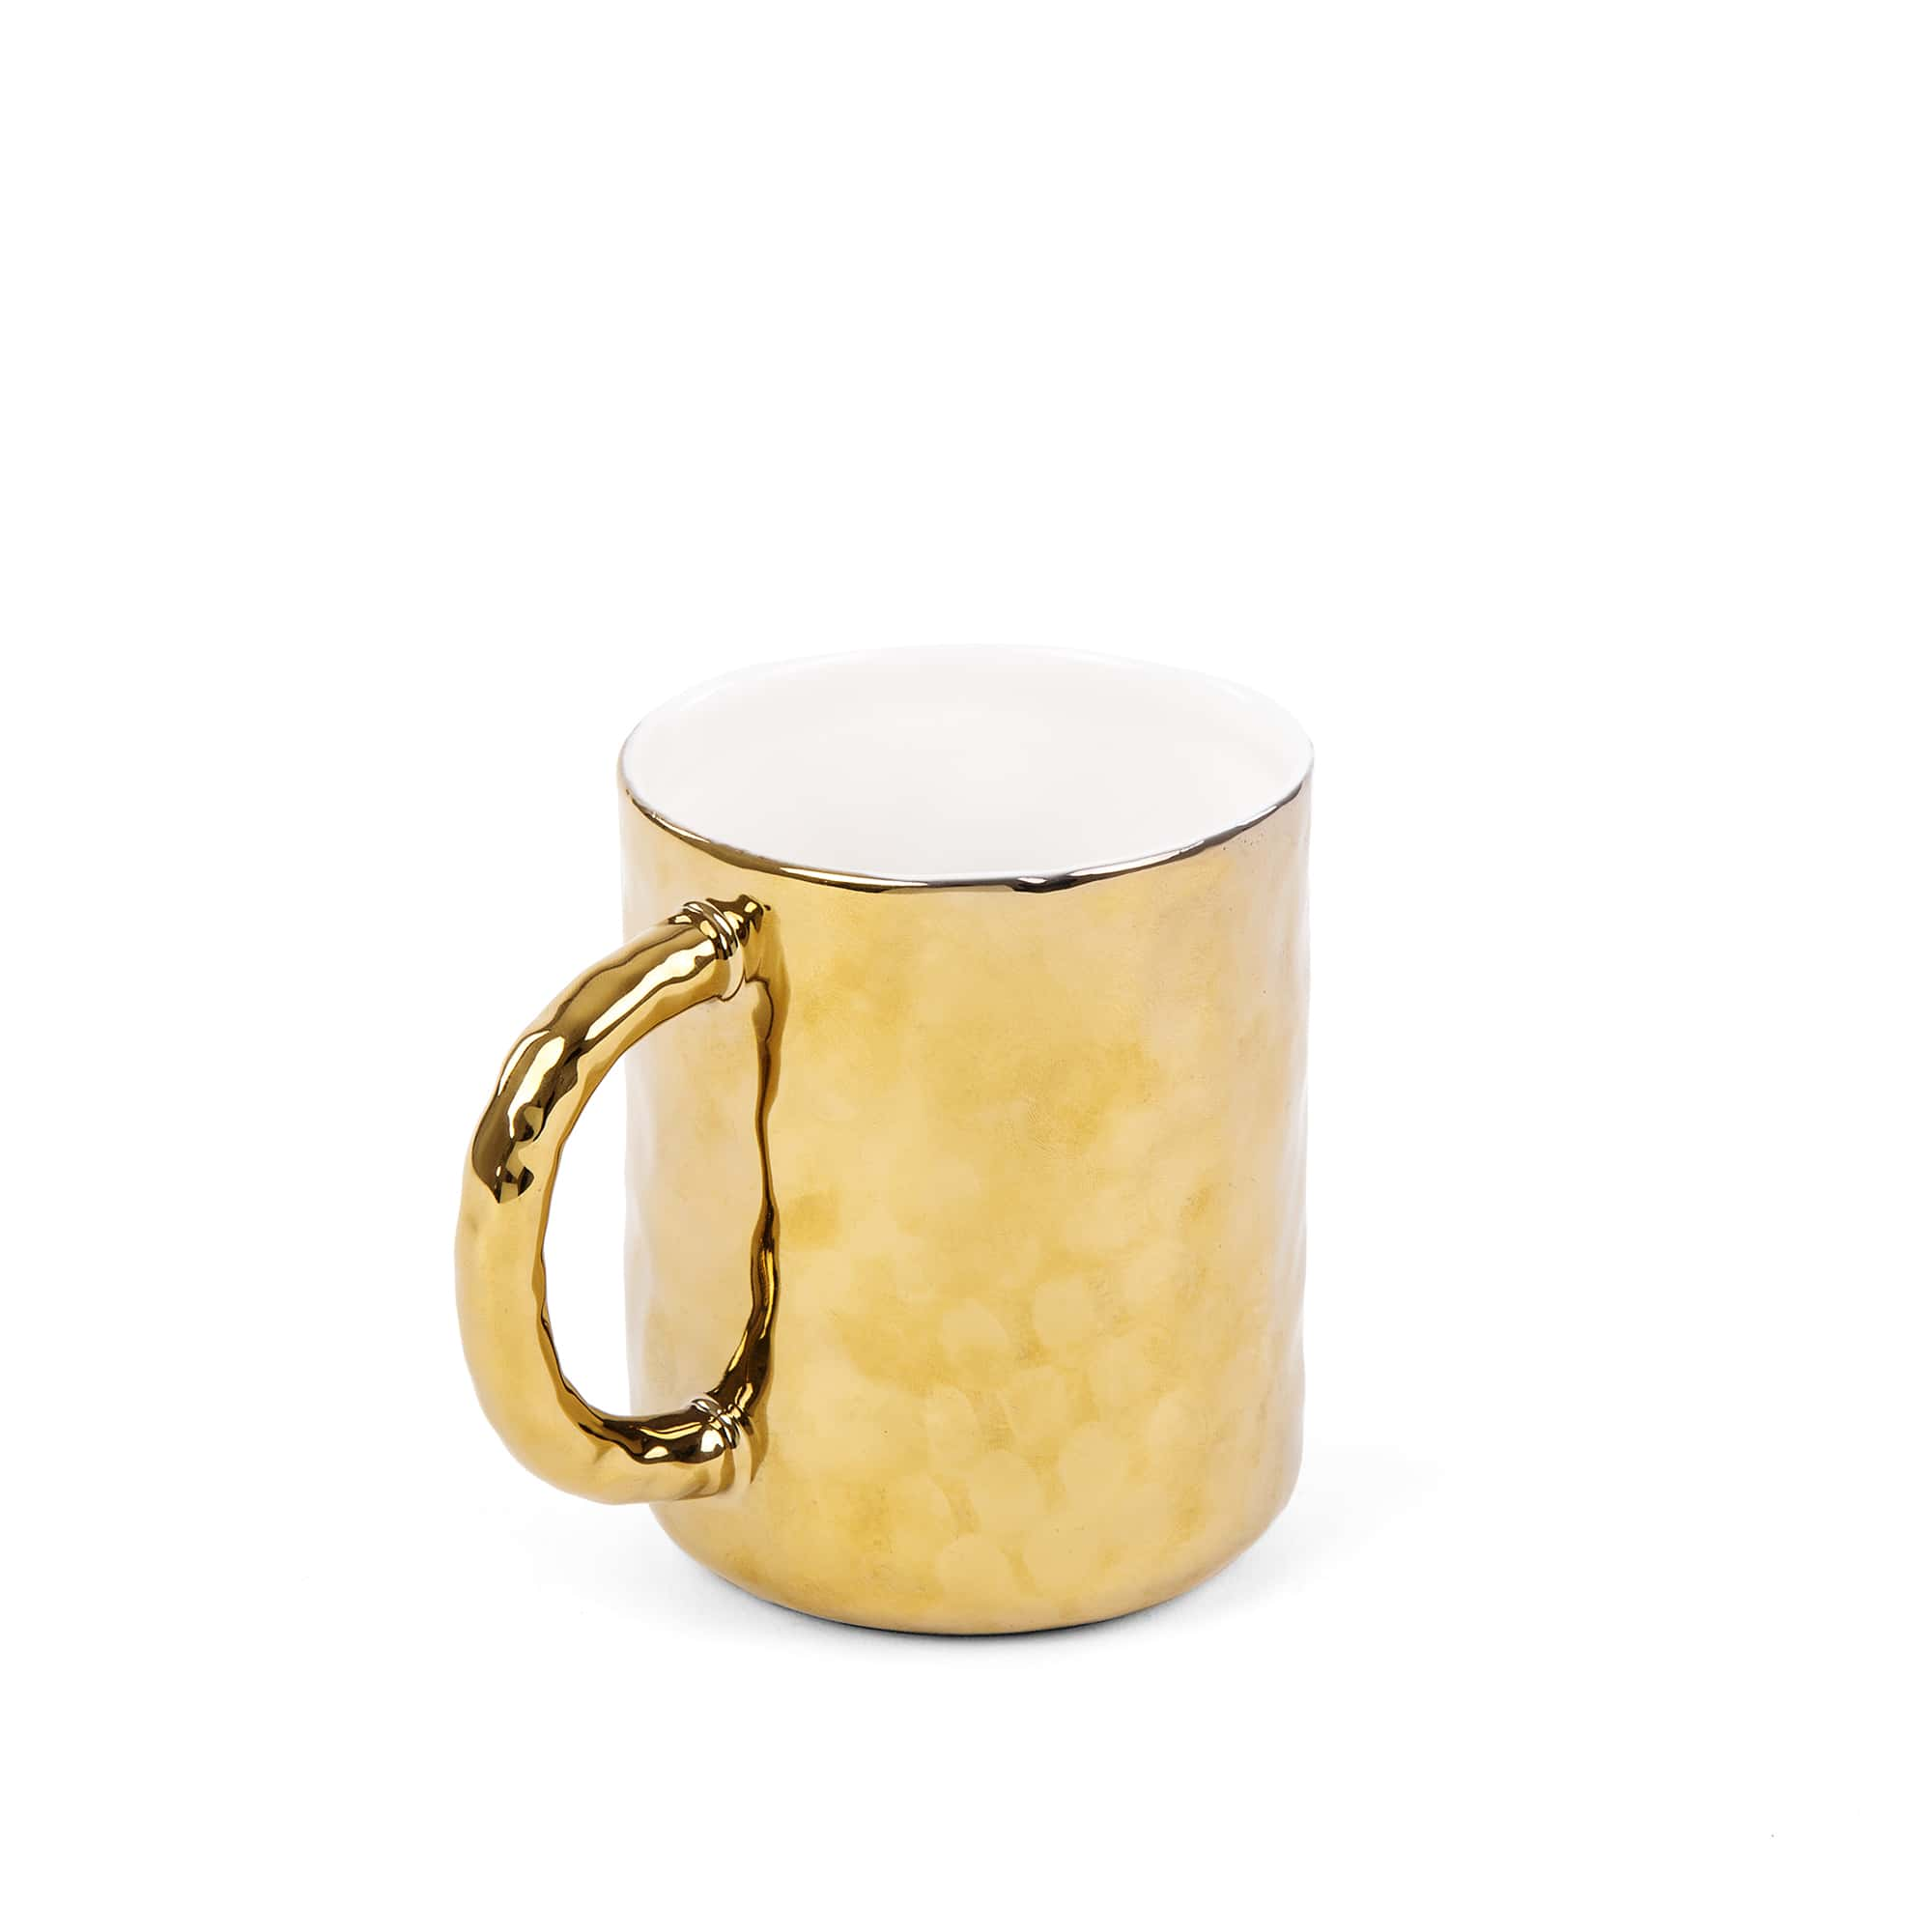 seletti-art-de-la-table-marcantonio-fingers-porcelain-09932-3W9A3509